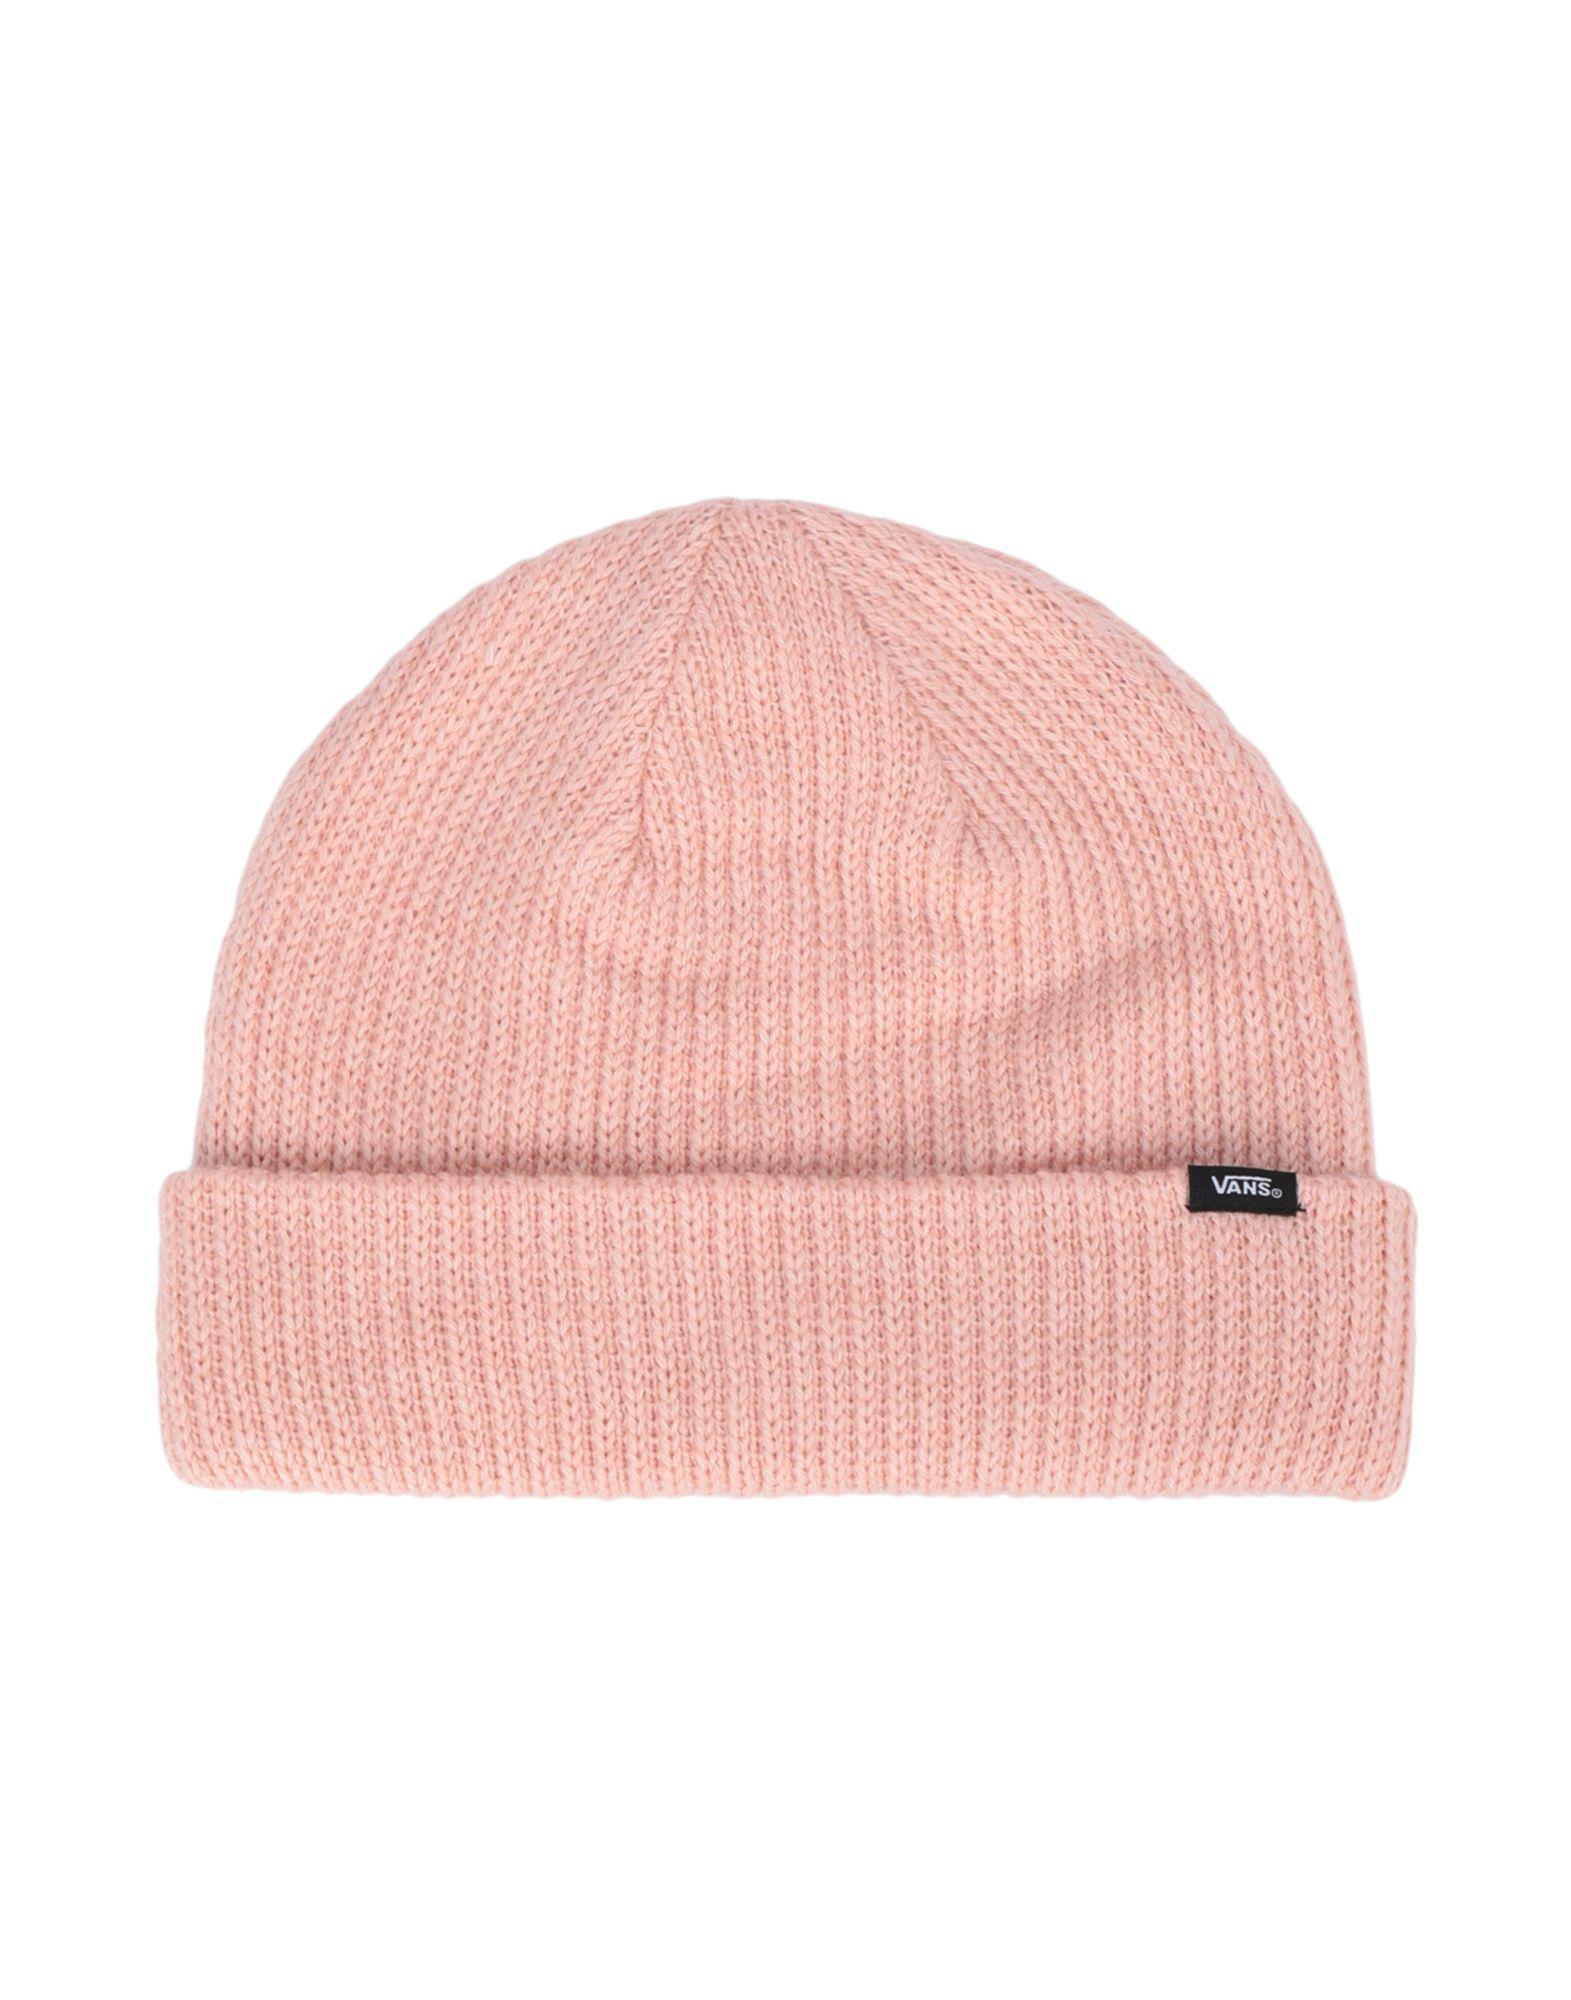 2288bca9a Vans Hat in Pink - Lyst